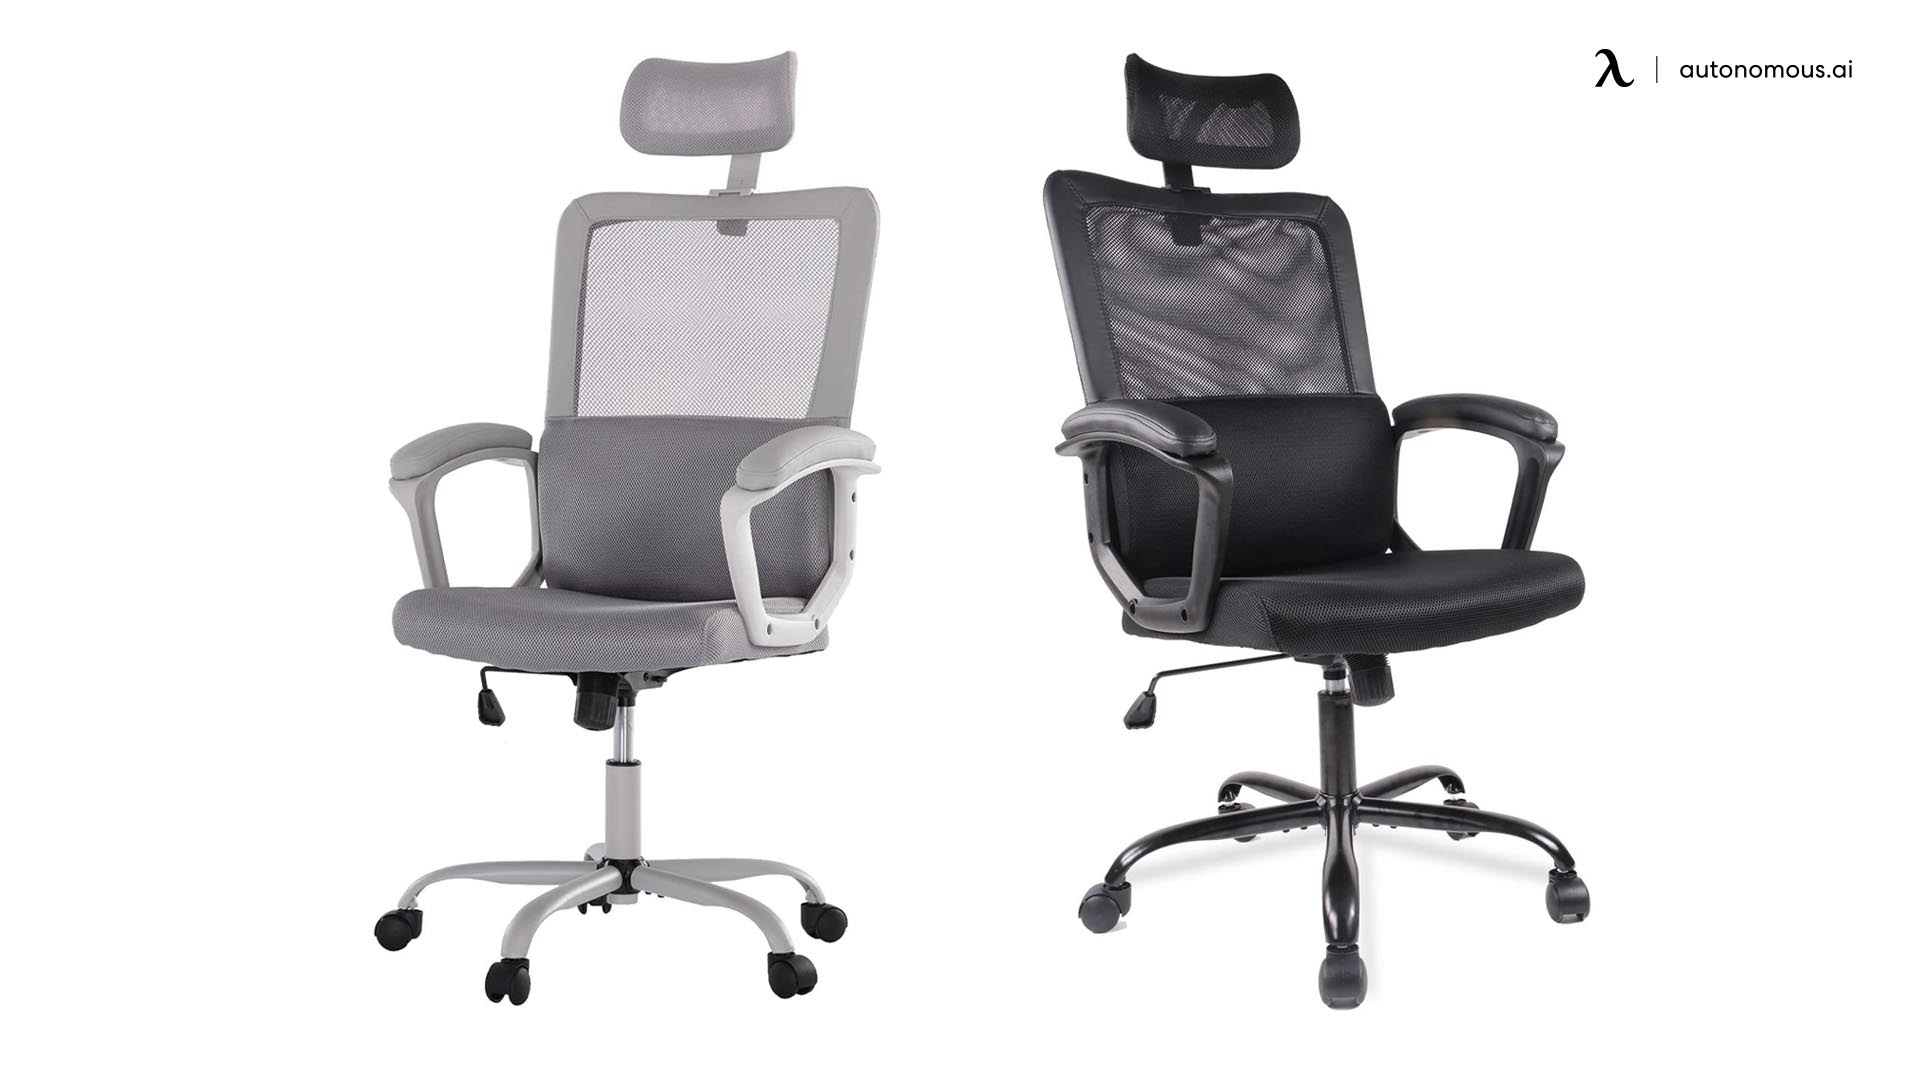 Smugdesk ergonomic office chair